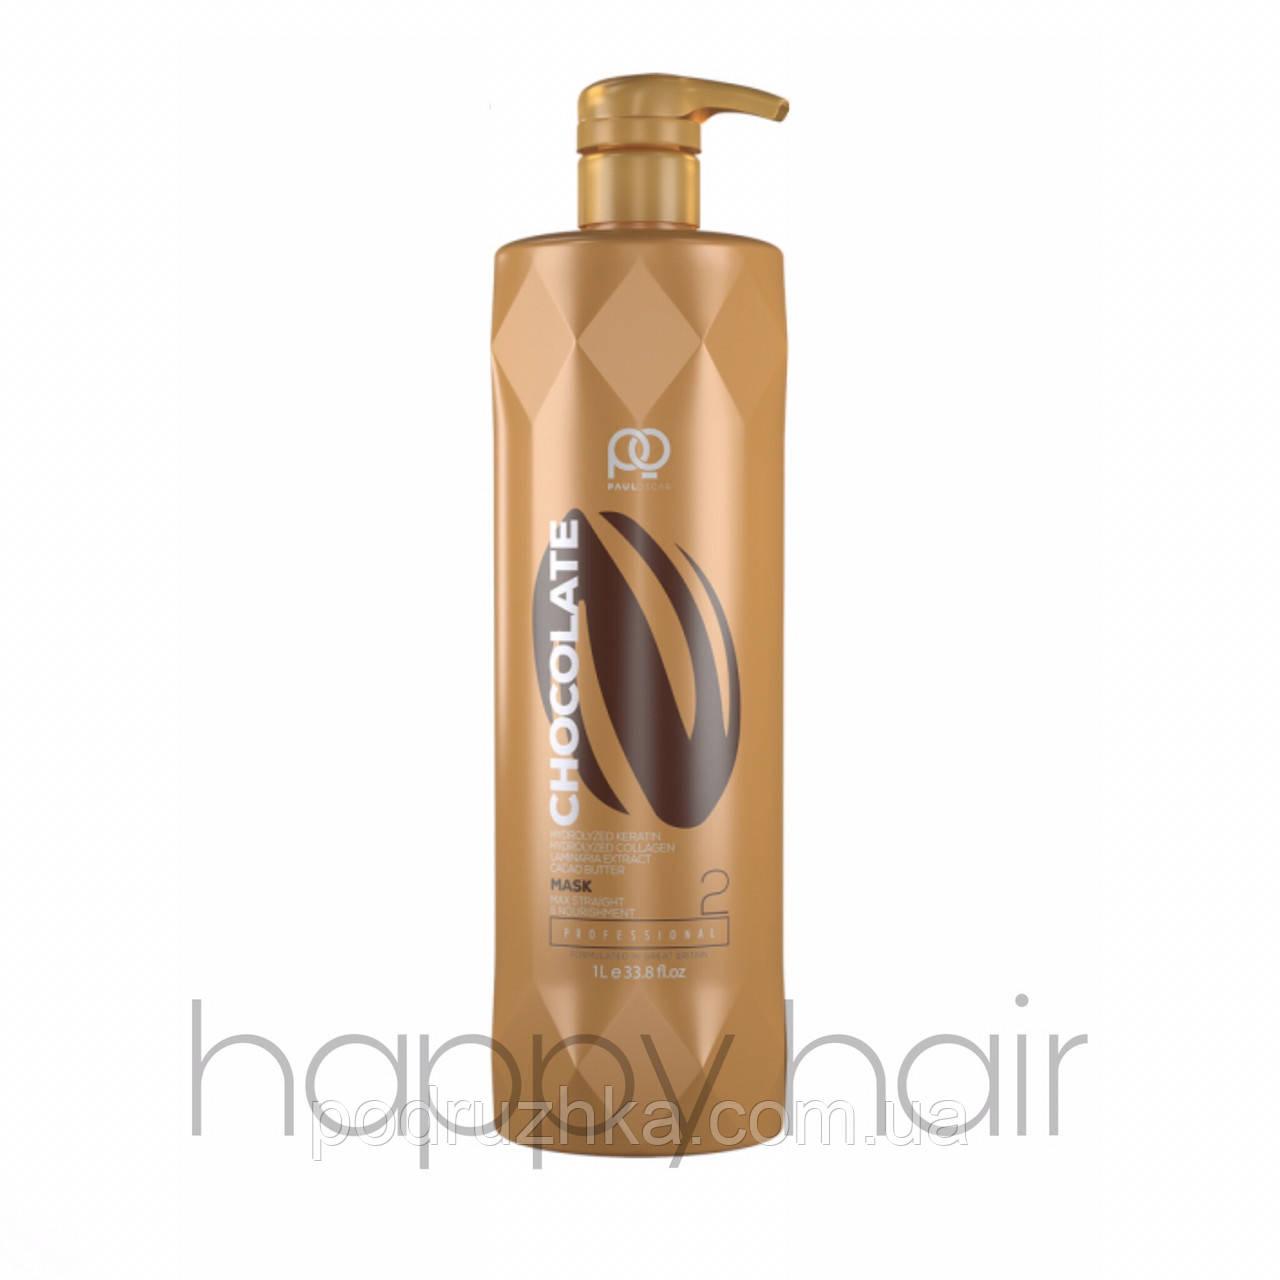 Кератин для волос Paul Oscar Chocolate Max Straight (шаг 2) 500 г